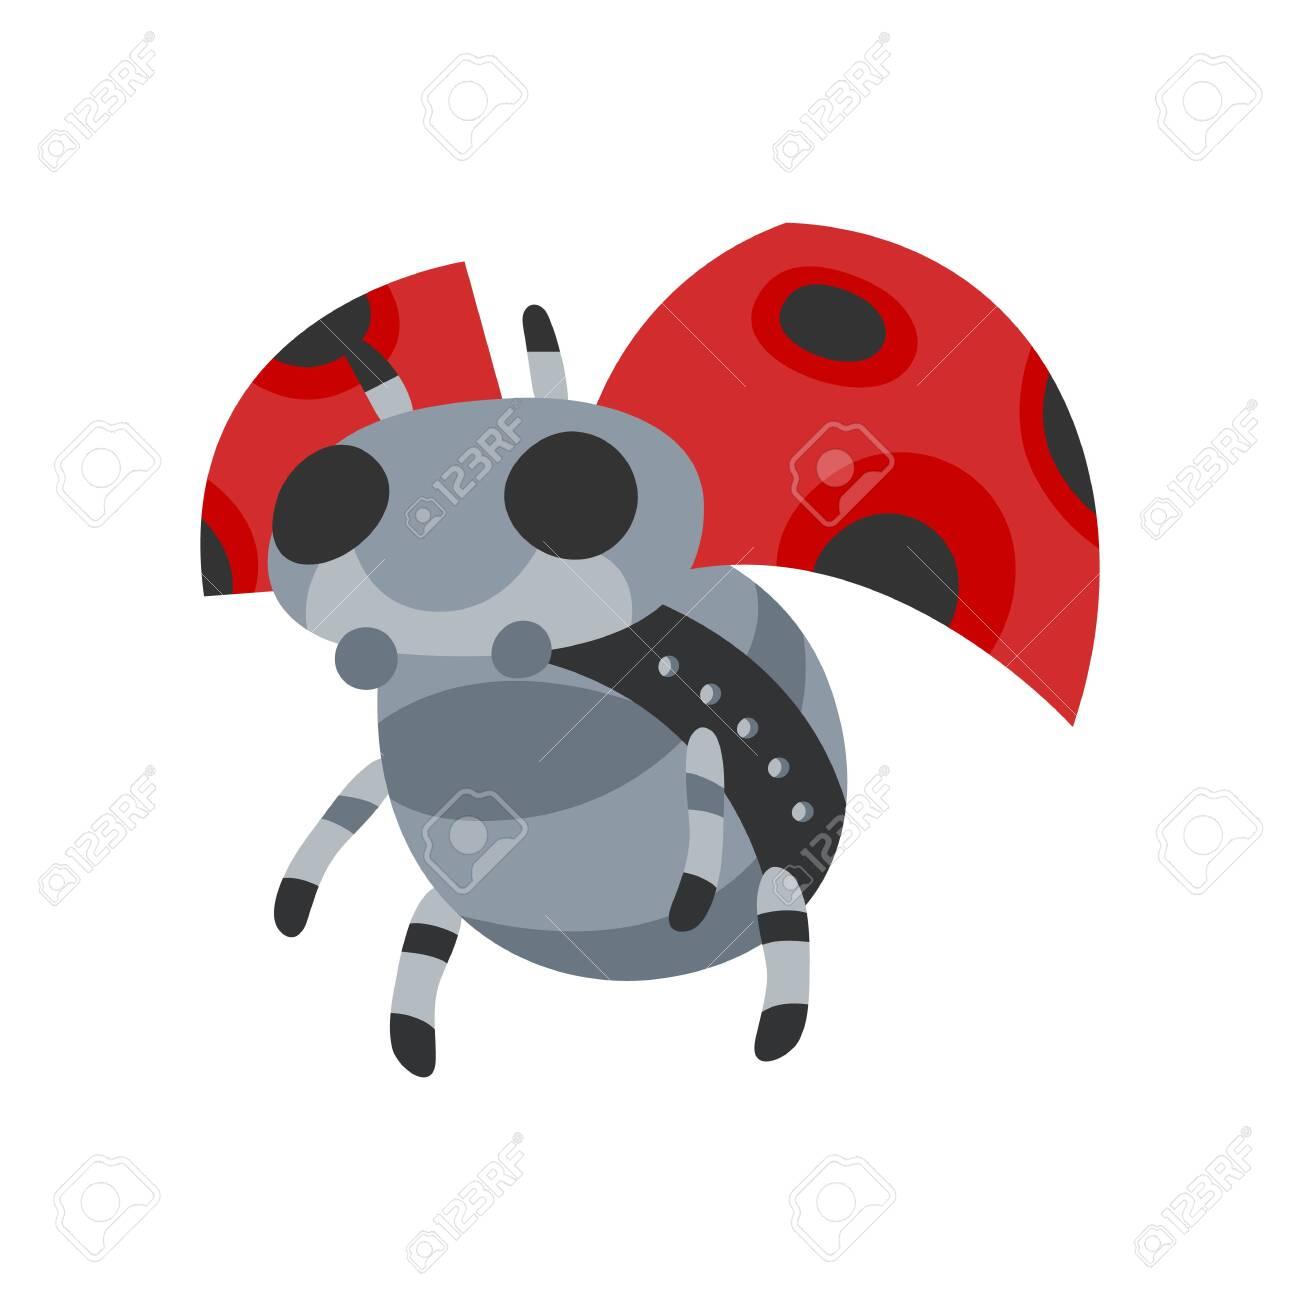 Vector Cartoon Mechanical Robotic Ladybug. Toy With Artificial ...